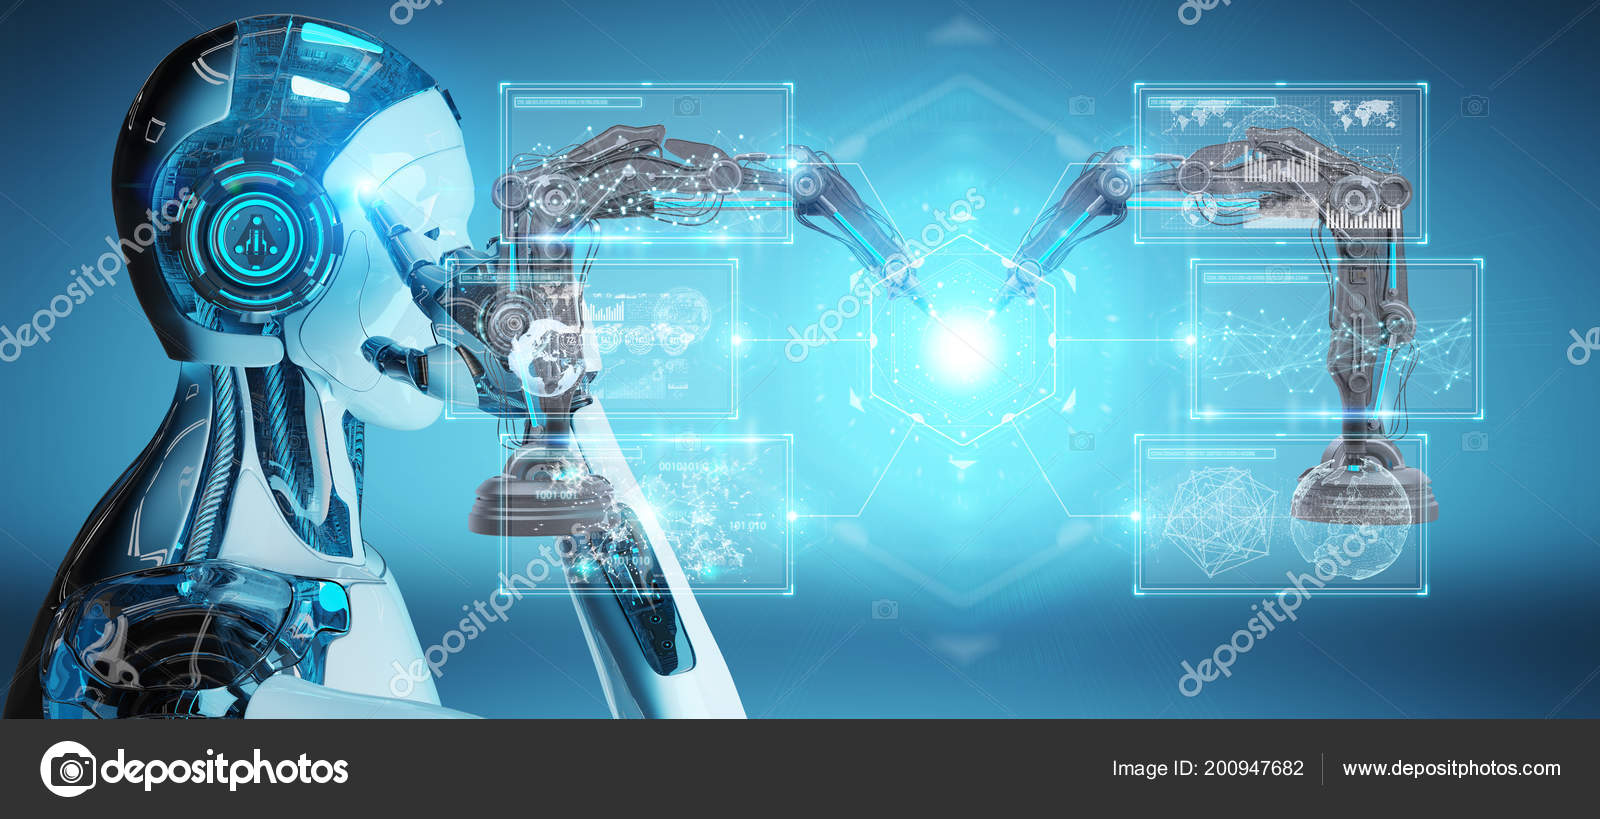 White Man Robot Blurred Background Using Robotics Arms Digital